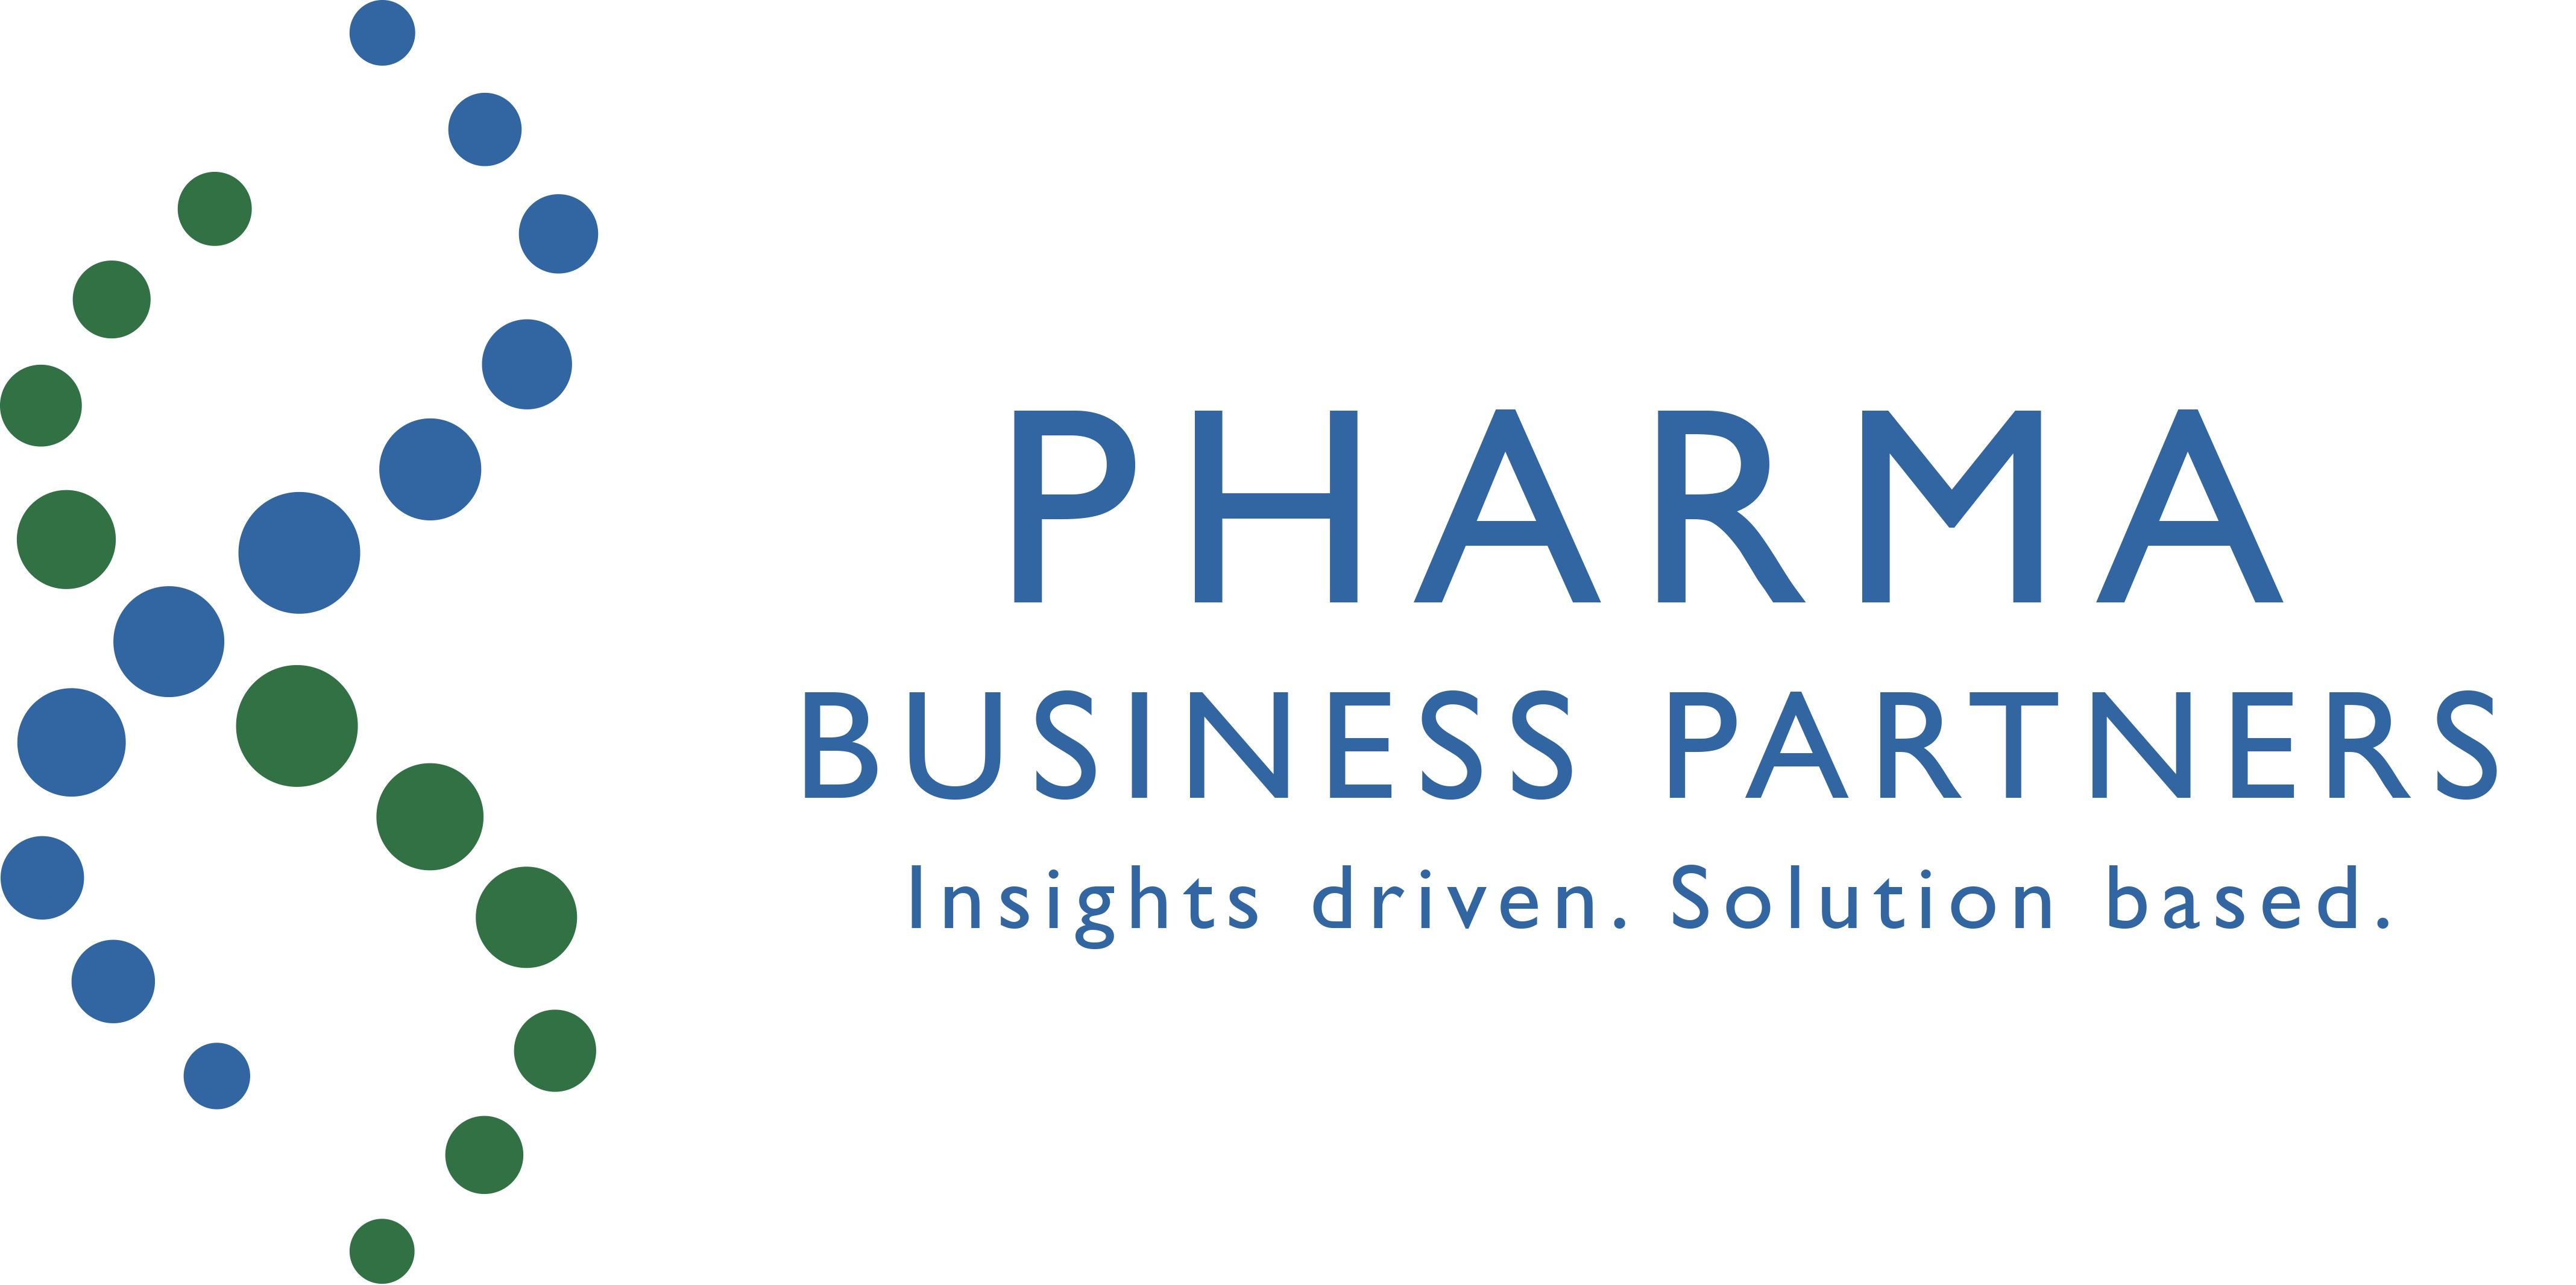 https://www.mncjobsgulf.com/company/pharma-bp-dmcc-1622614685